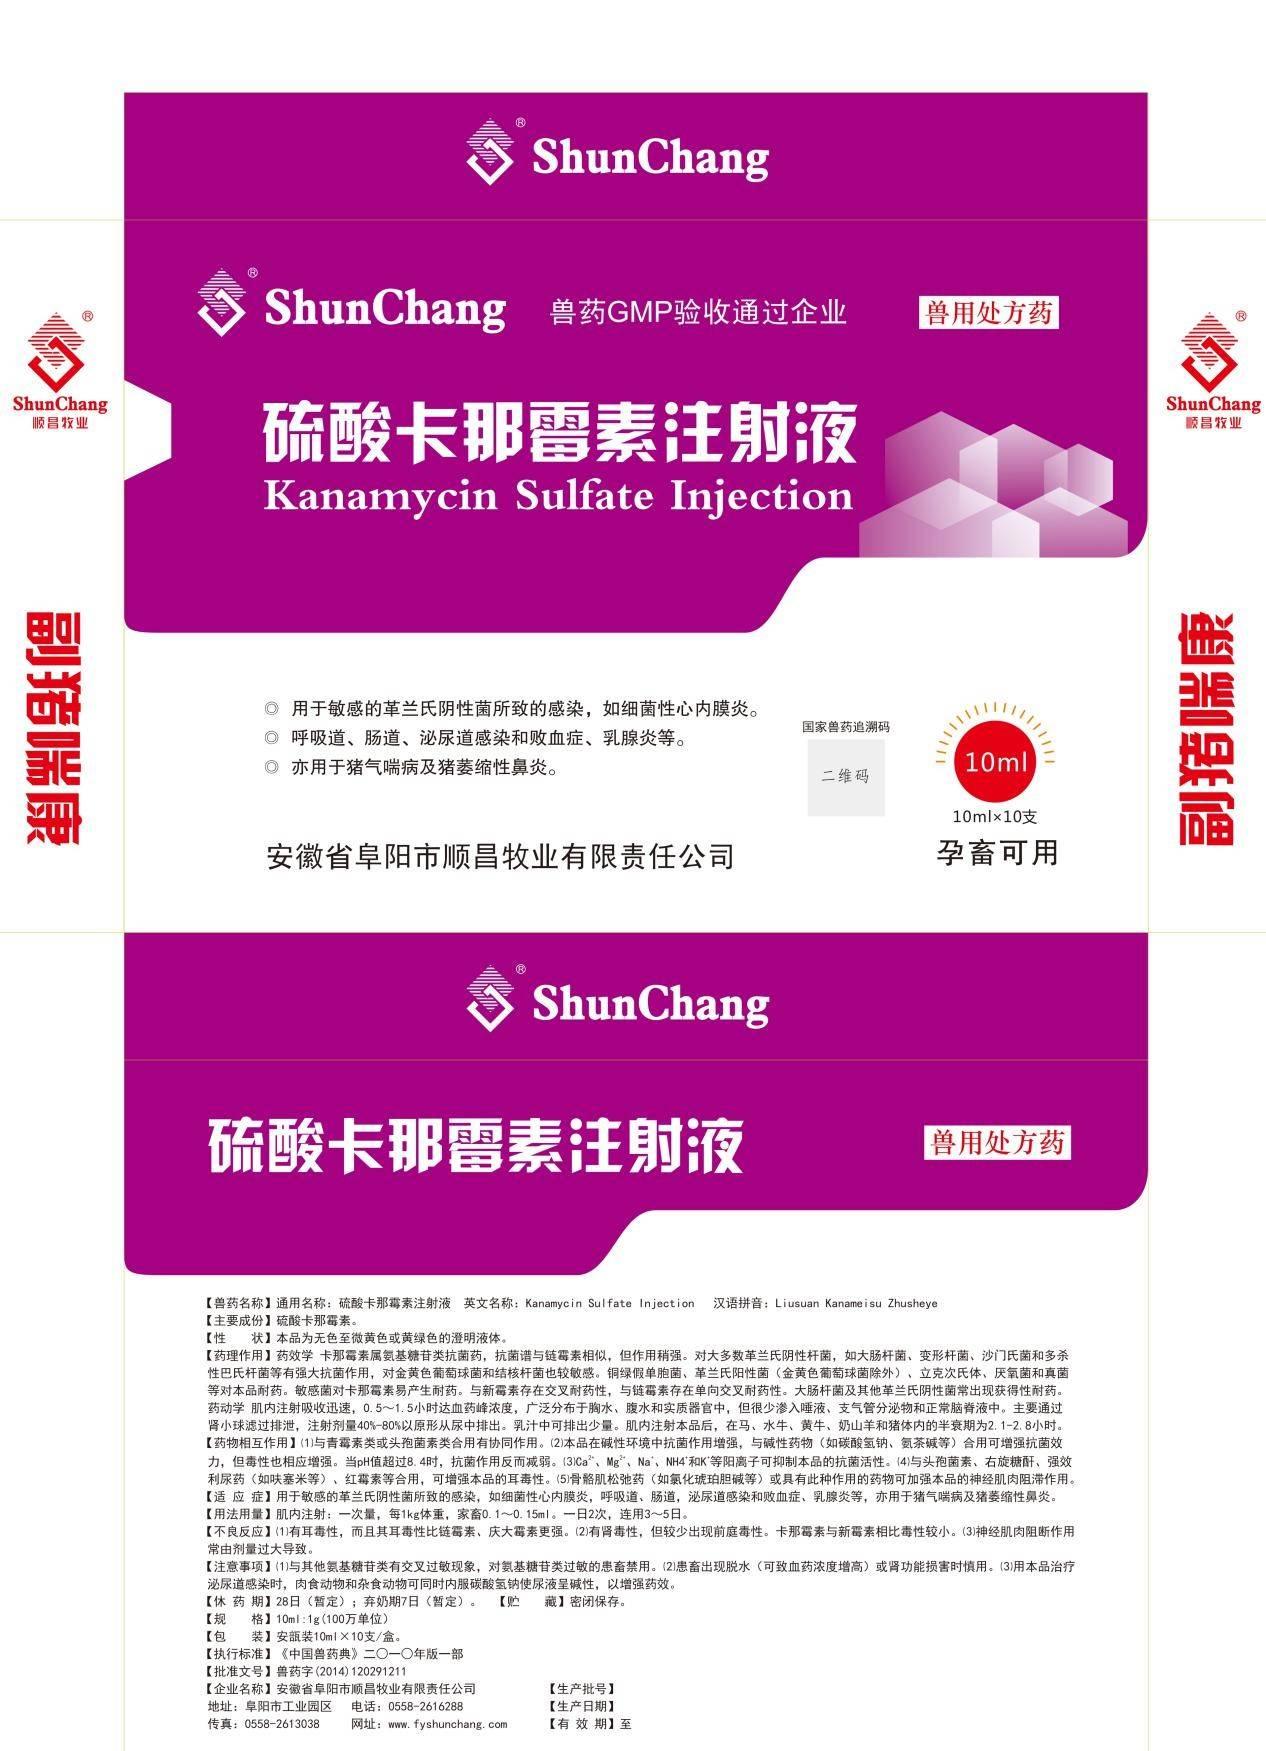 Kanamycin sulfate injection